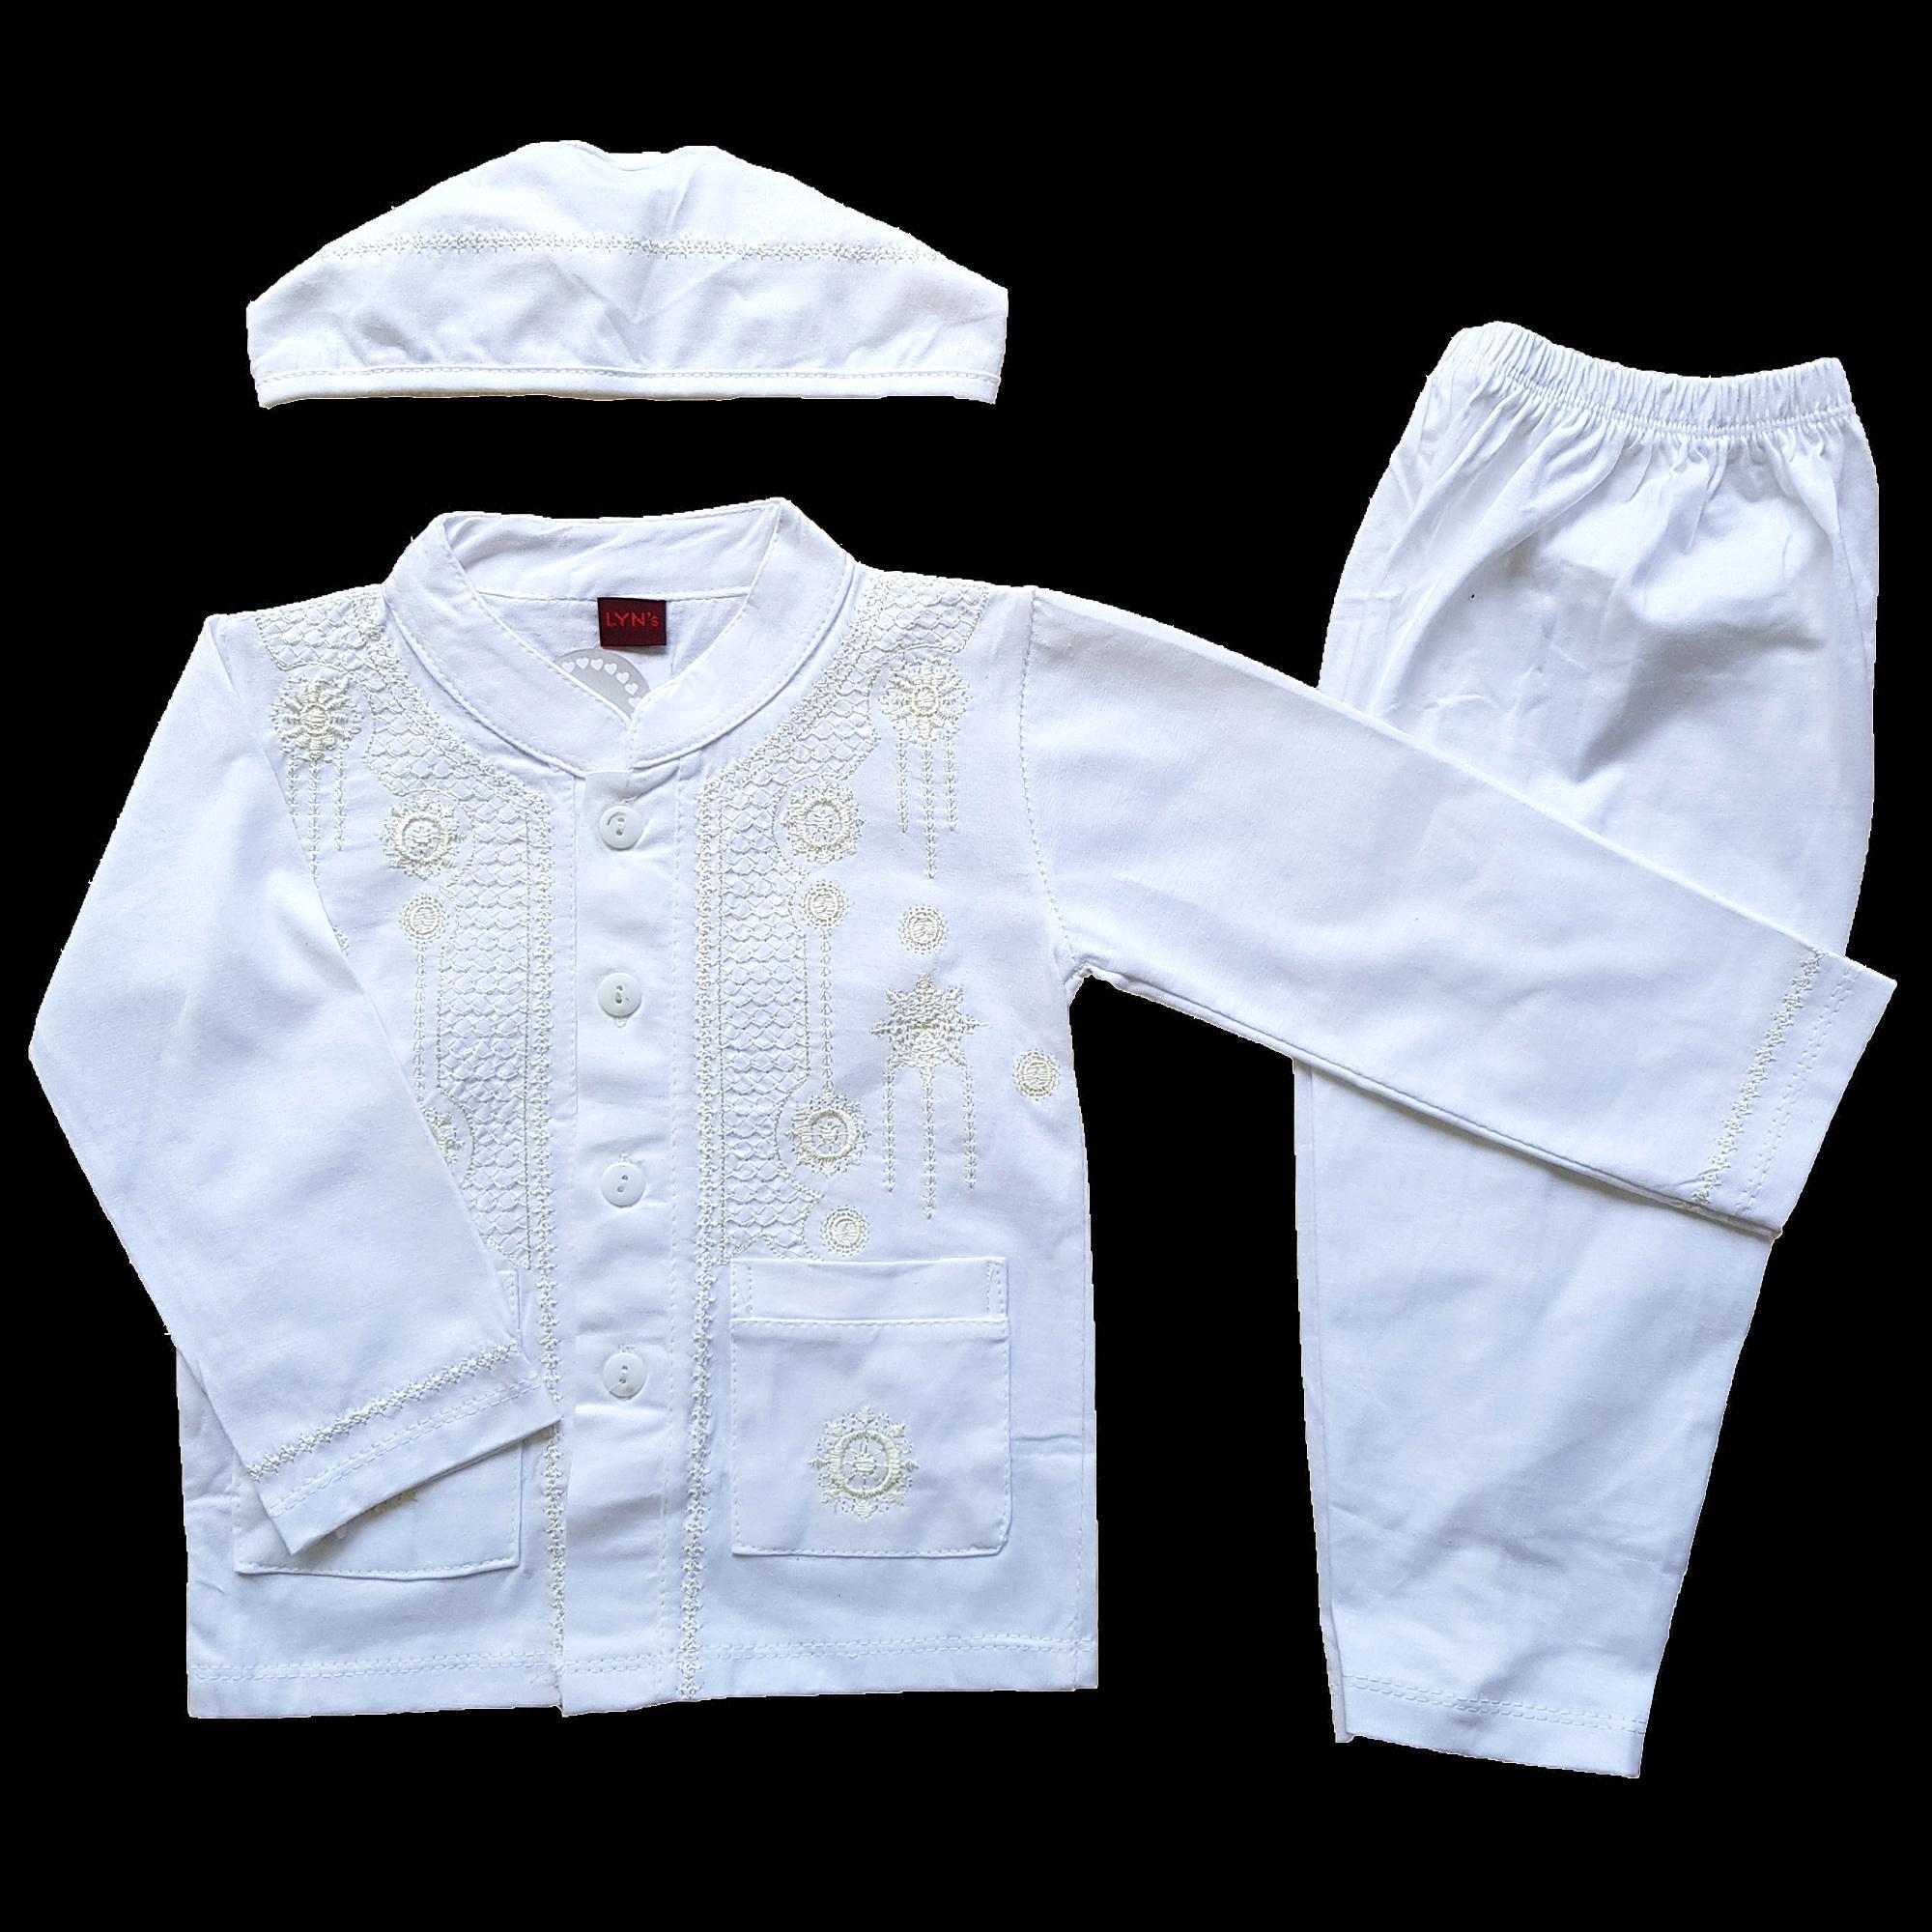 Baju Muslim Koko (6-12 Bulan) Anak Bayi Laki-Laki Setelan Set Peci LY8